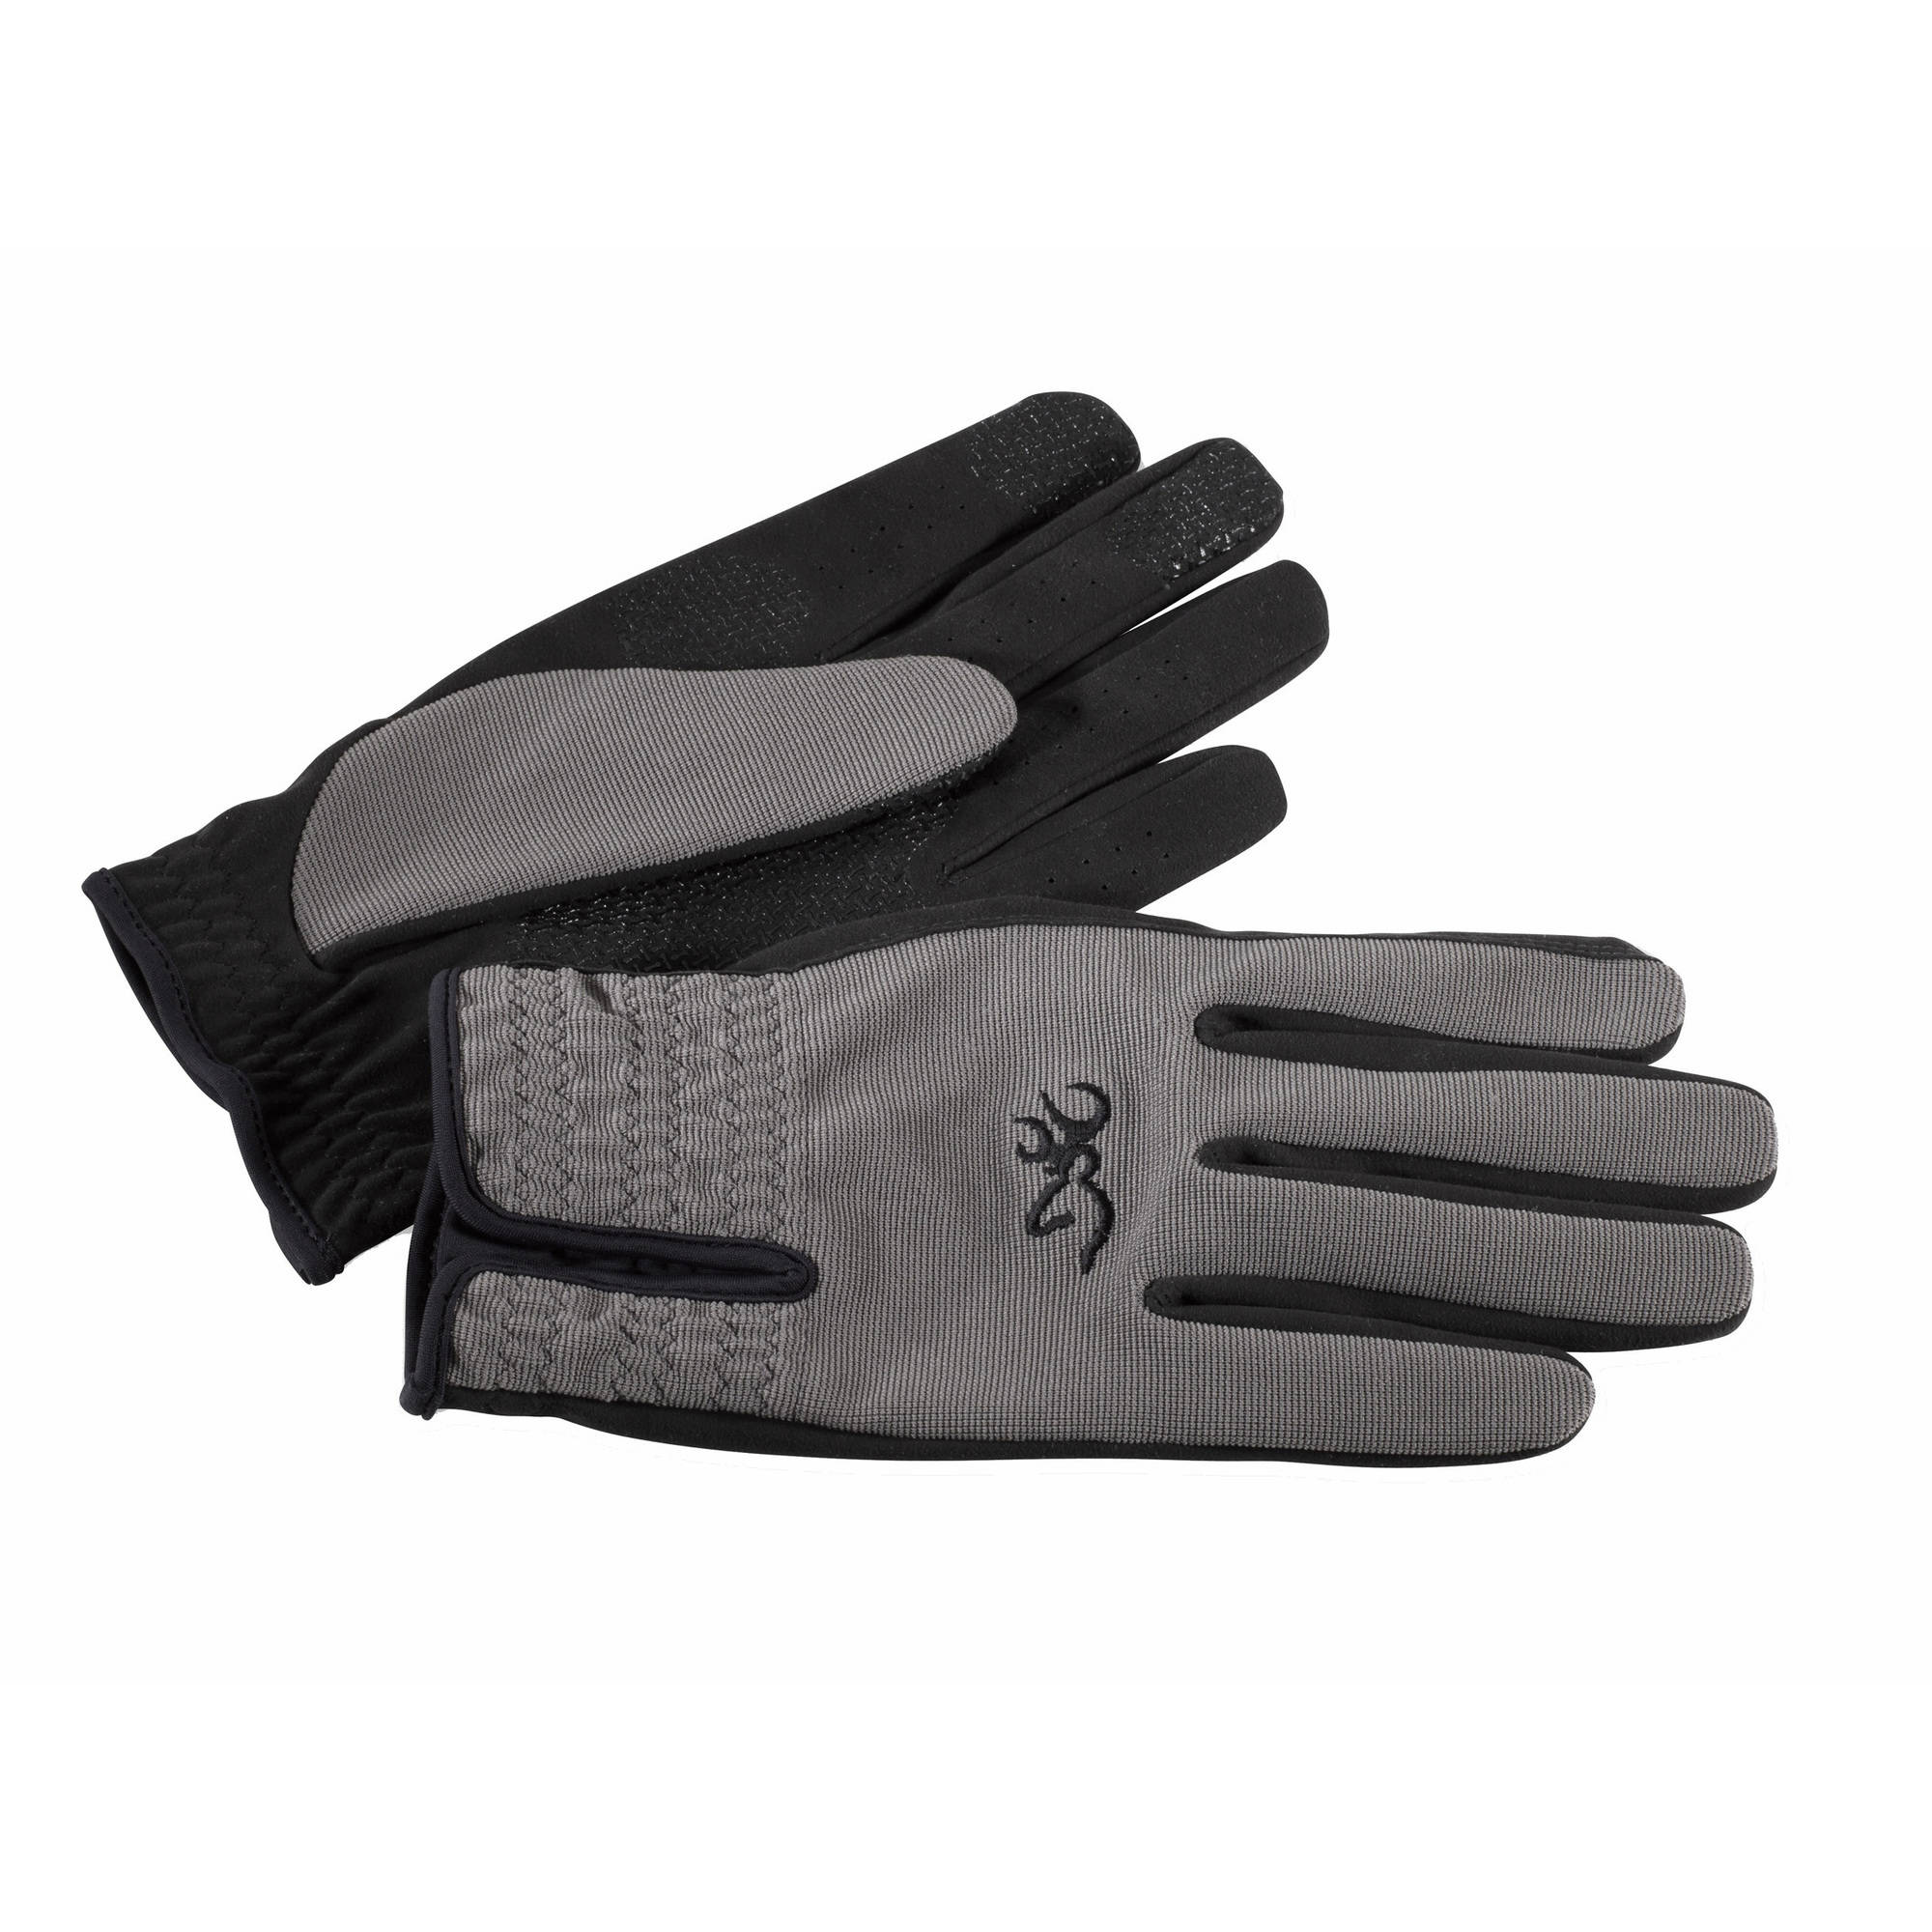 Trapper Creek Glove, Charcoal